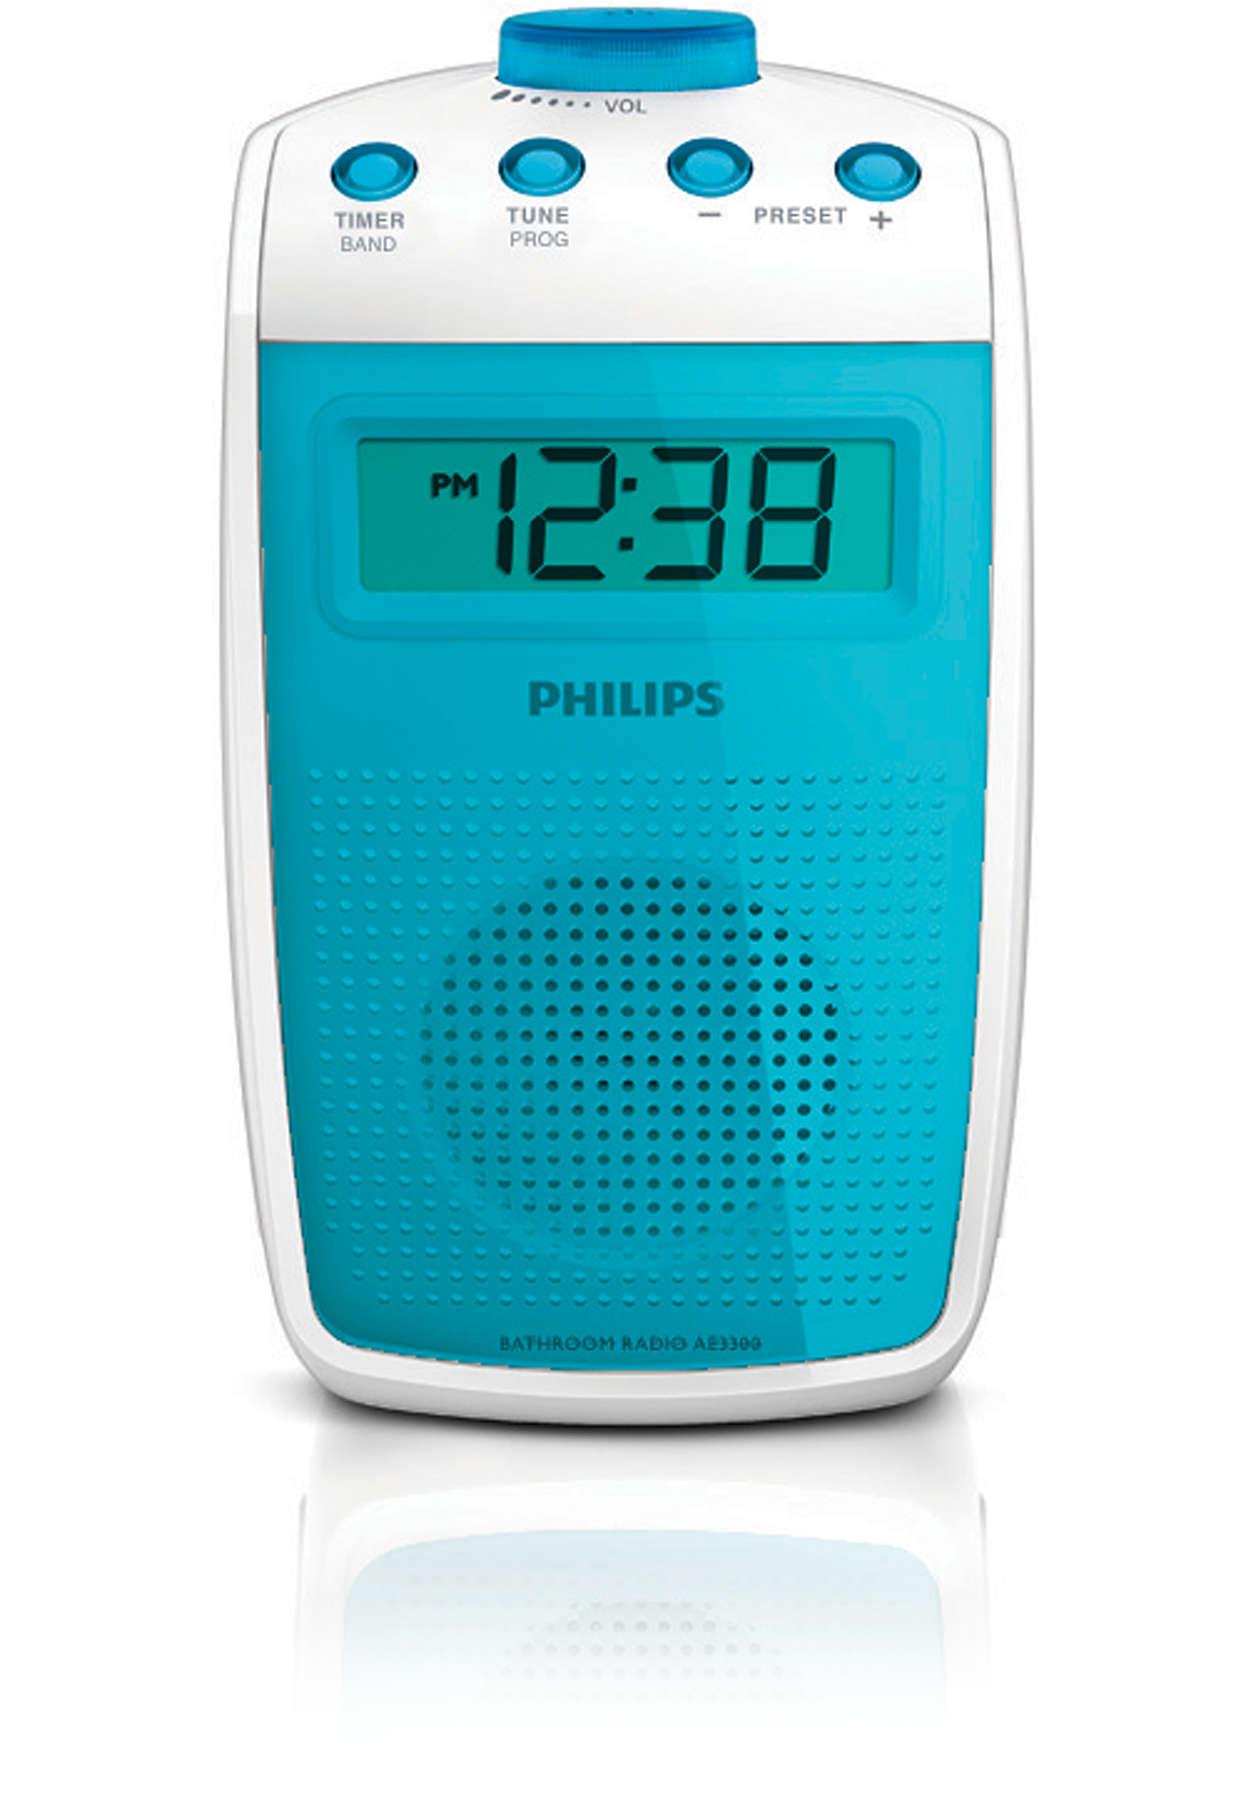 Badkamerradio AE3300/00 | Philips